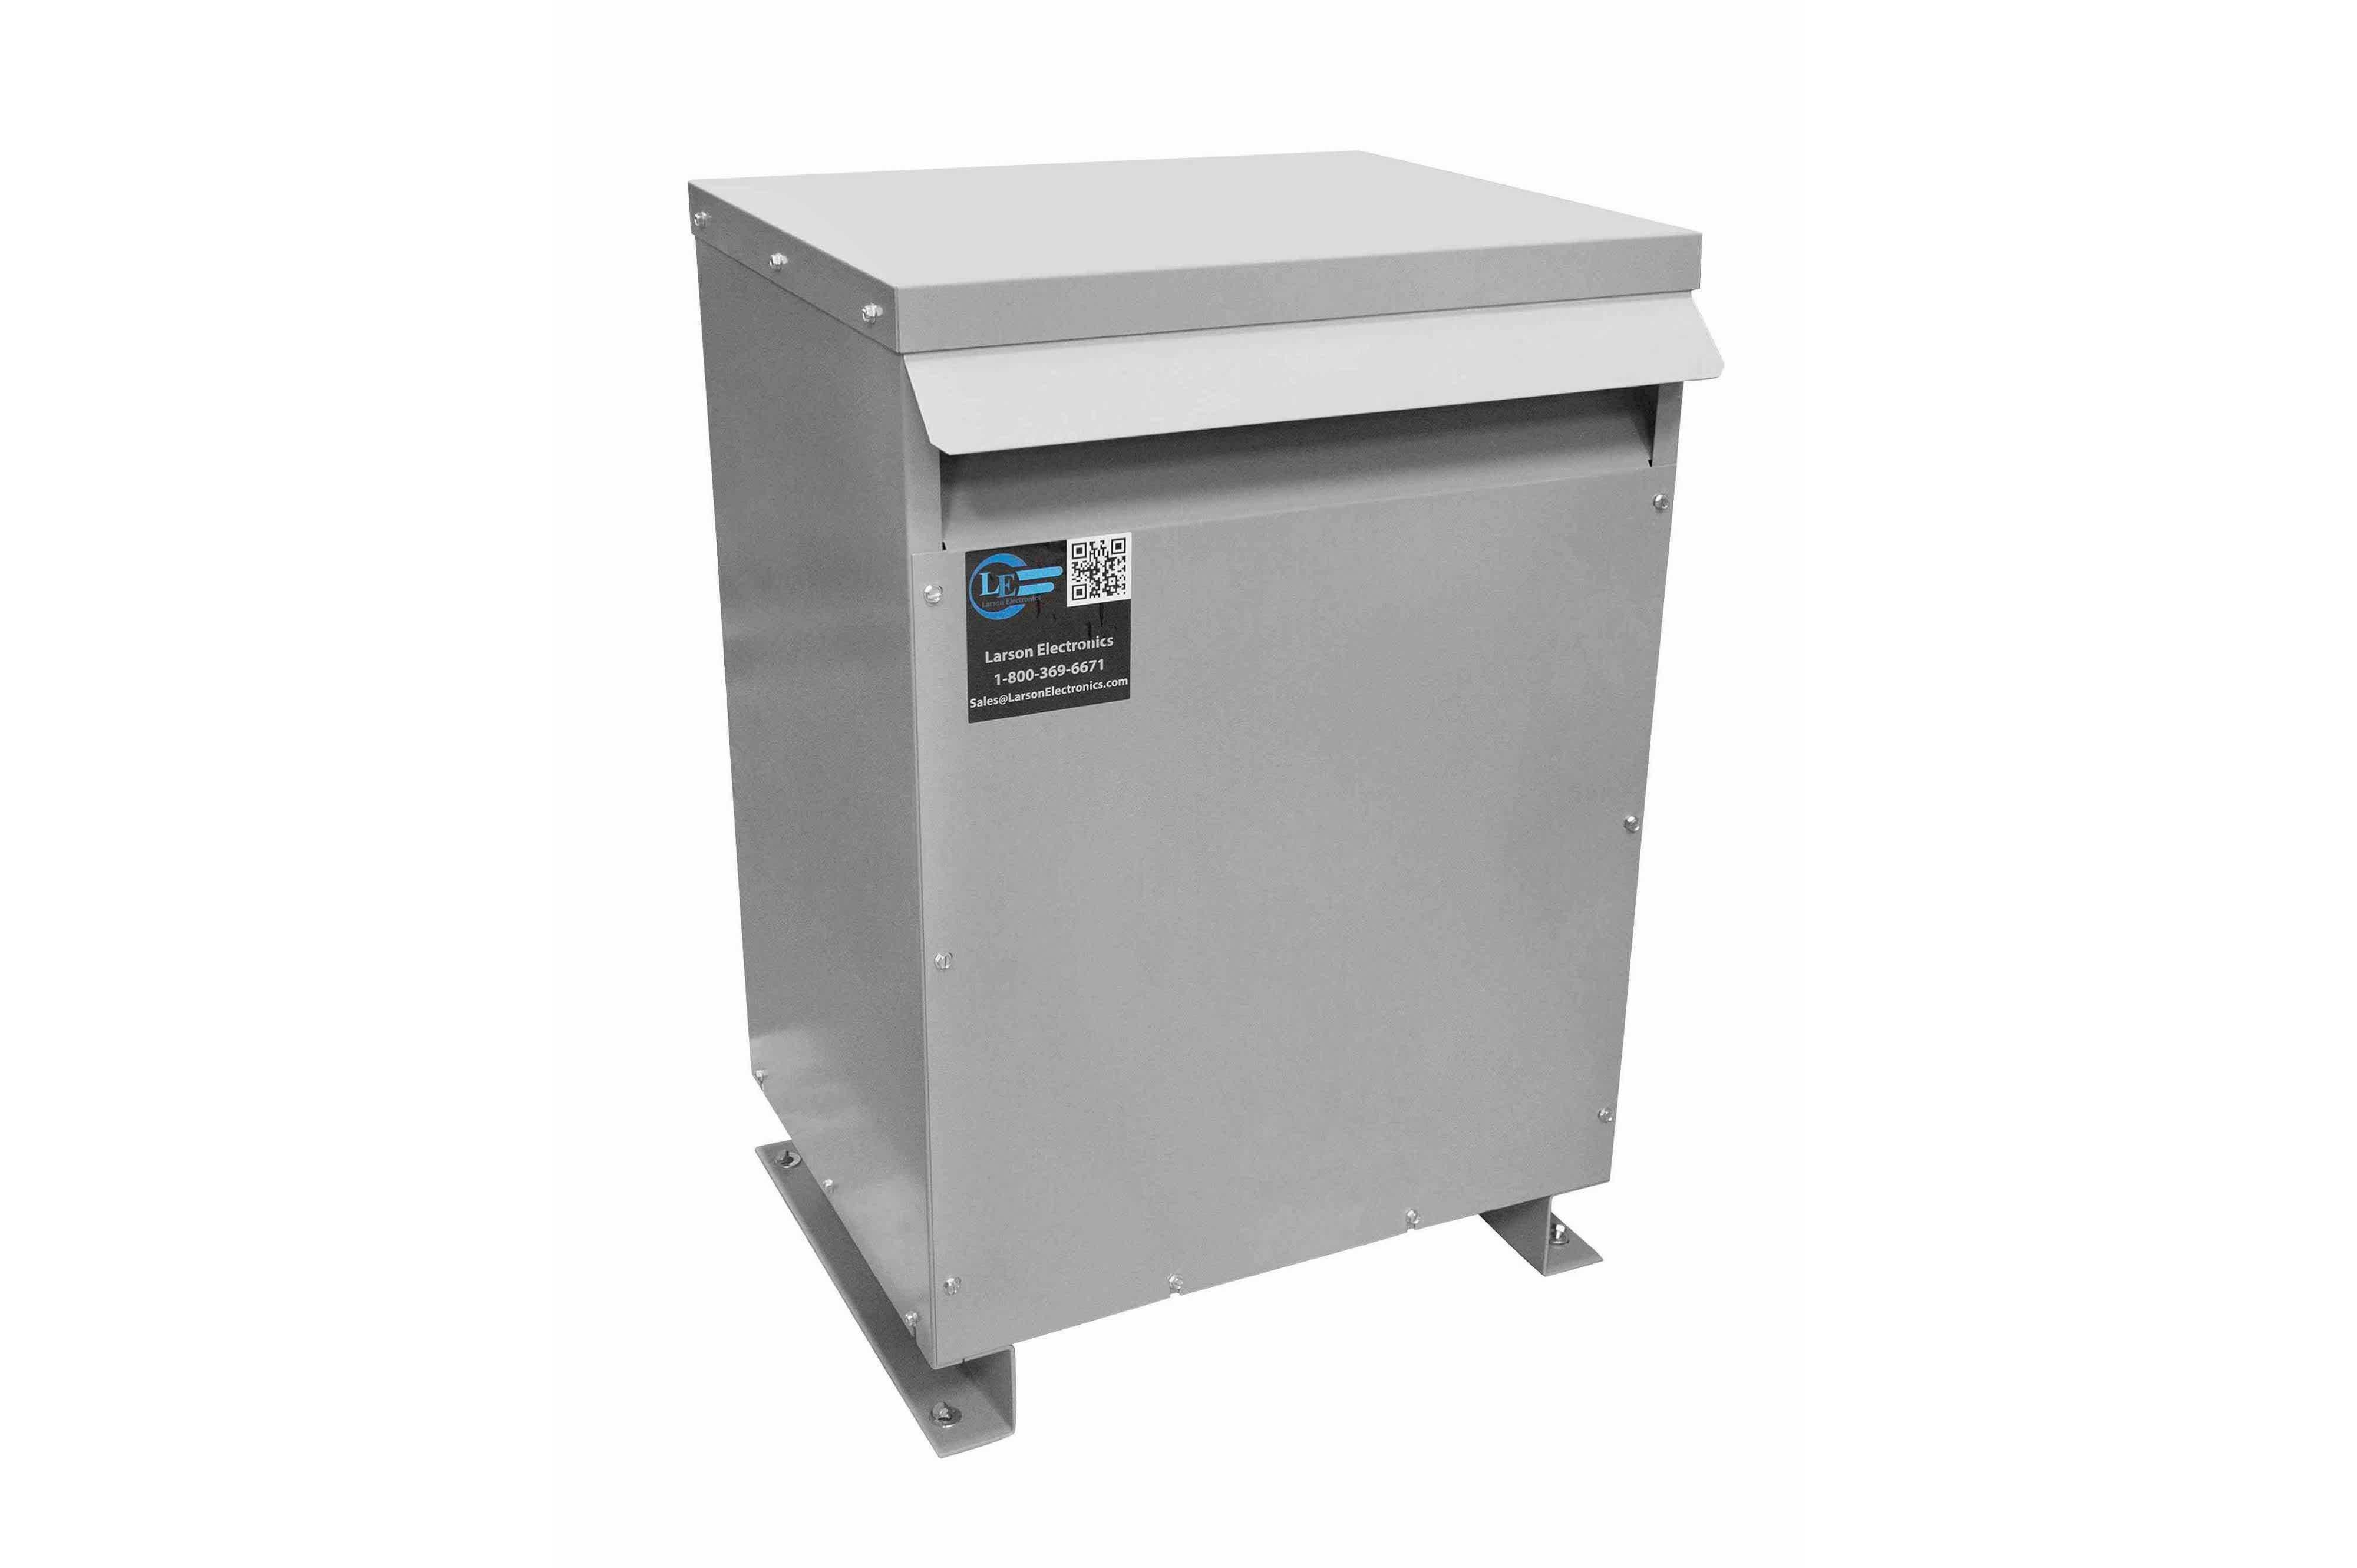 600 kVA 3PH Isolation Transformer, 460V Wye Primary, 400V Delta Secondary, N3R, Ventilated, 60 Hz